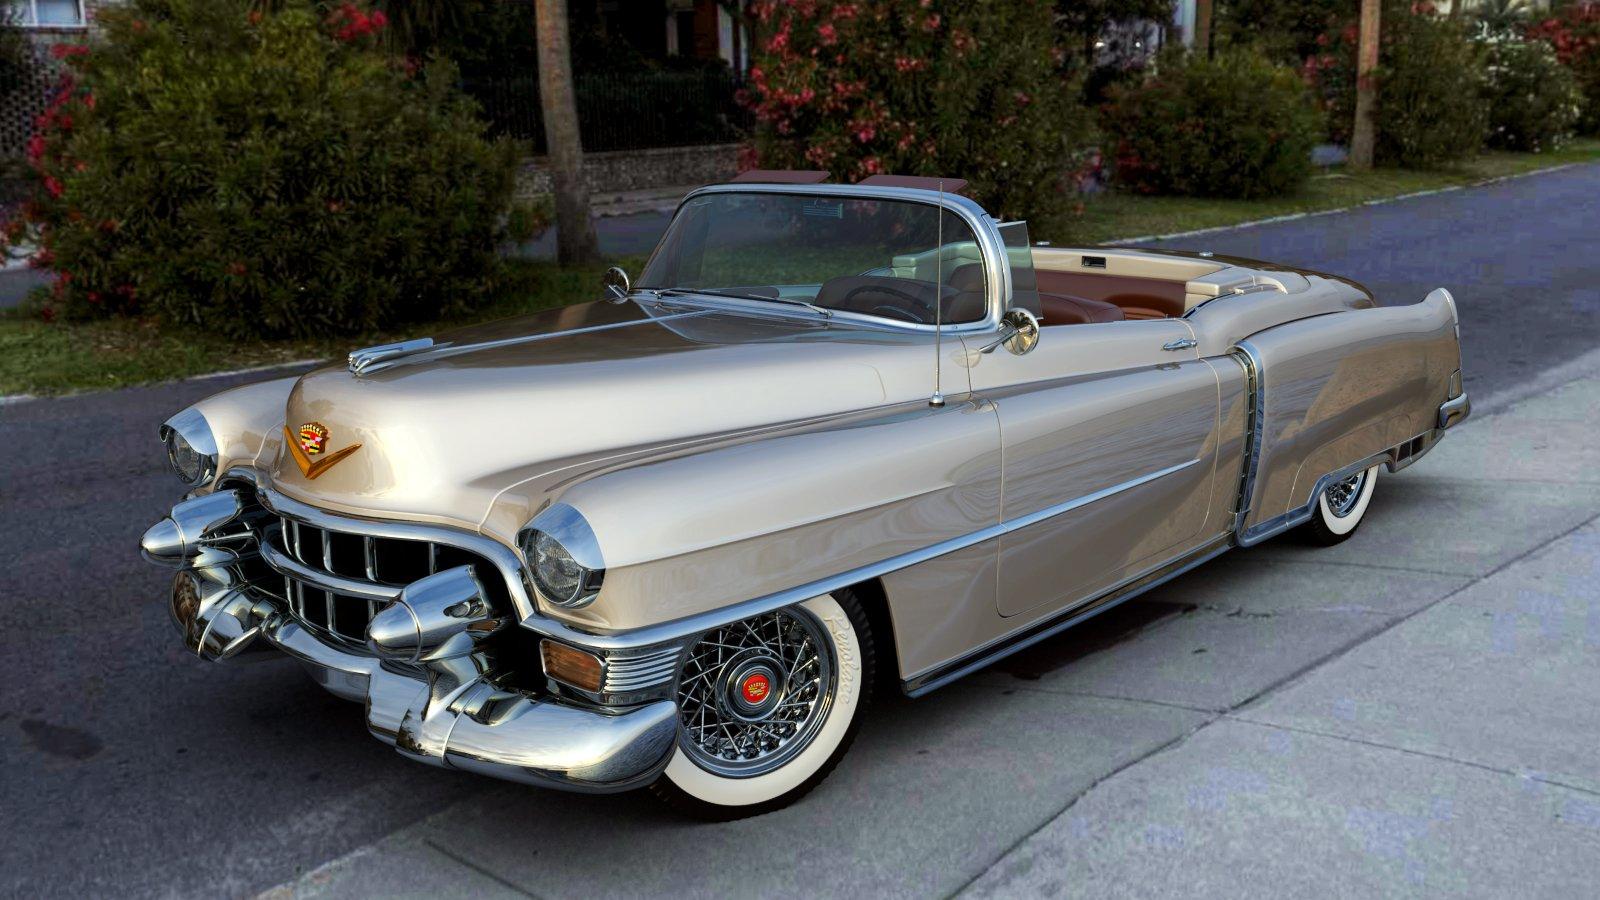 1953 Cadillac Wallpaper 1600x900 251008 Wallpaperup